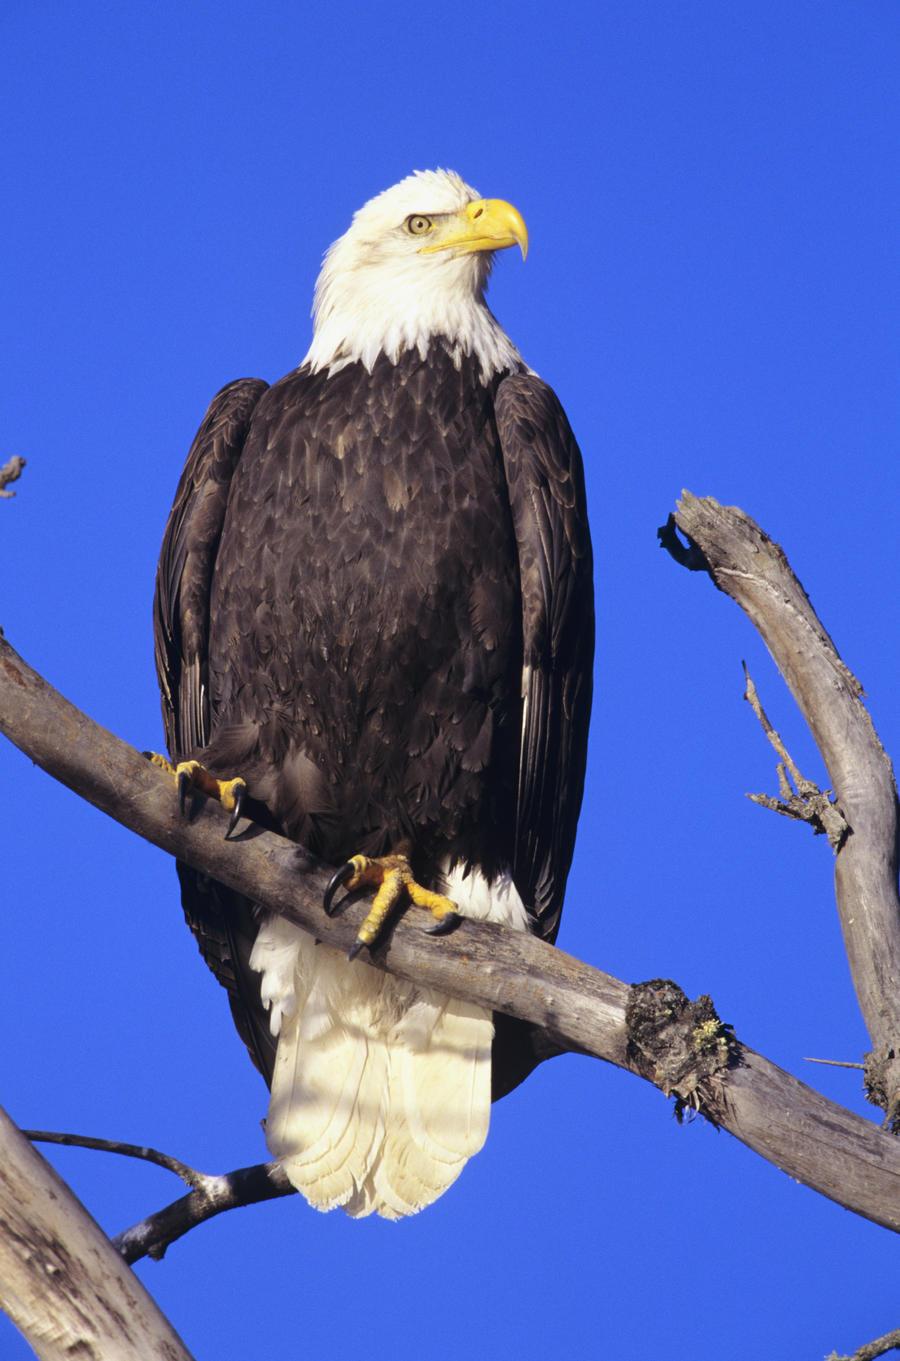 Alaska, Haines Bald Eagle Reserve, Bald Eagle (Haliaeetus Leucocephalus) Perched On A Branch.  Print